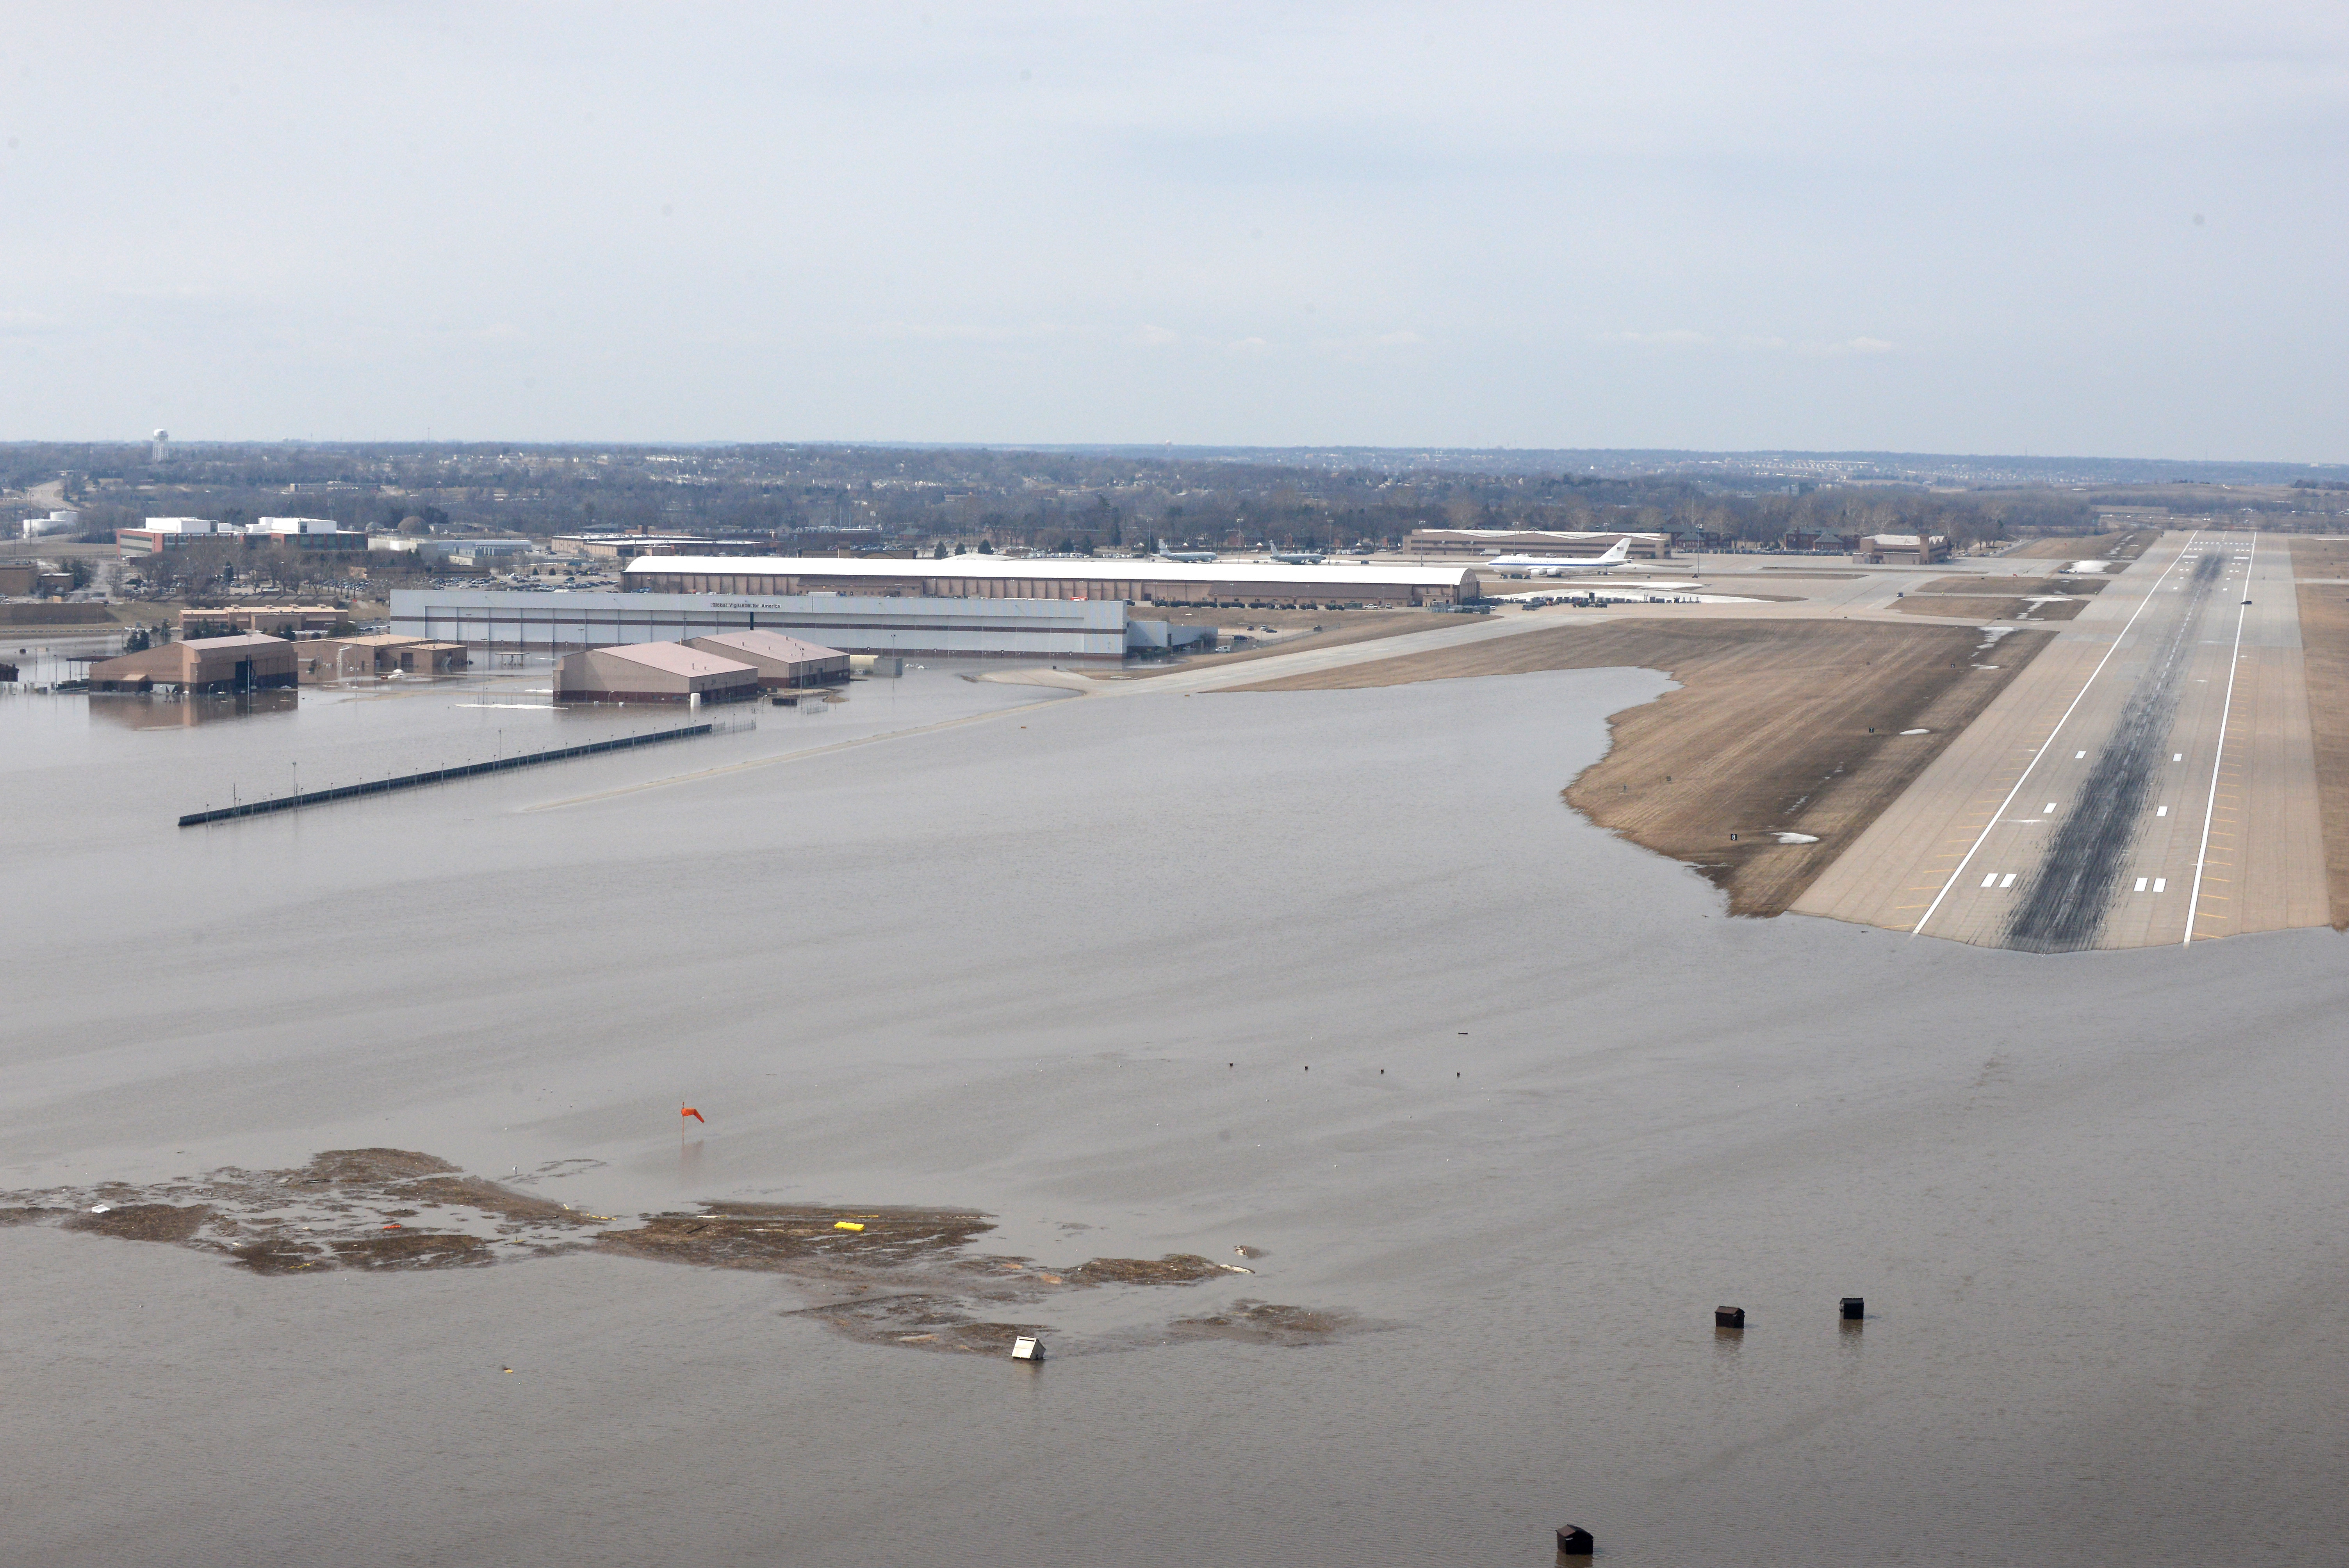 Offutt Air Force Base_battling_flood_waters_190317-F-IT794-1053